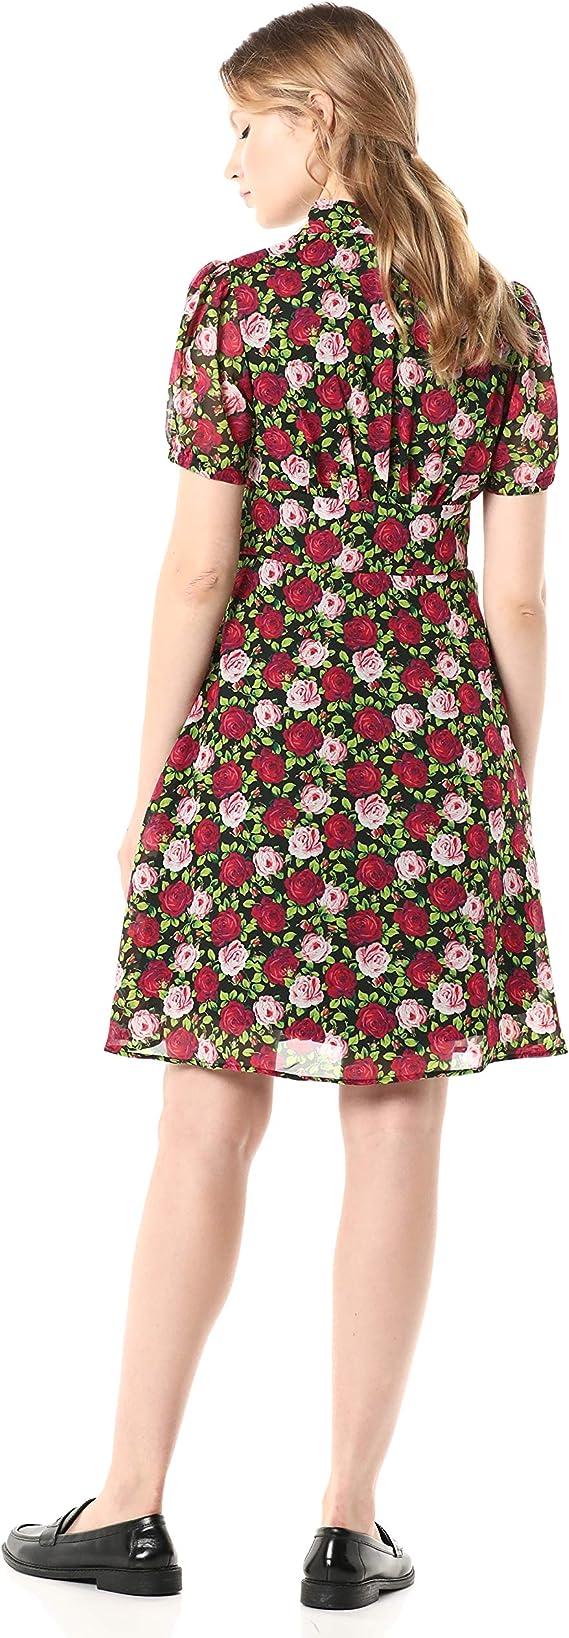 Betsey Johnson Womens Bouquet Floral Midi Dress